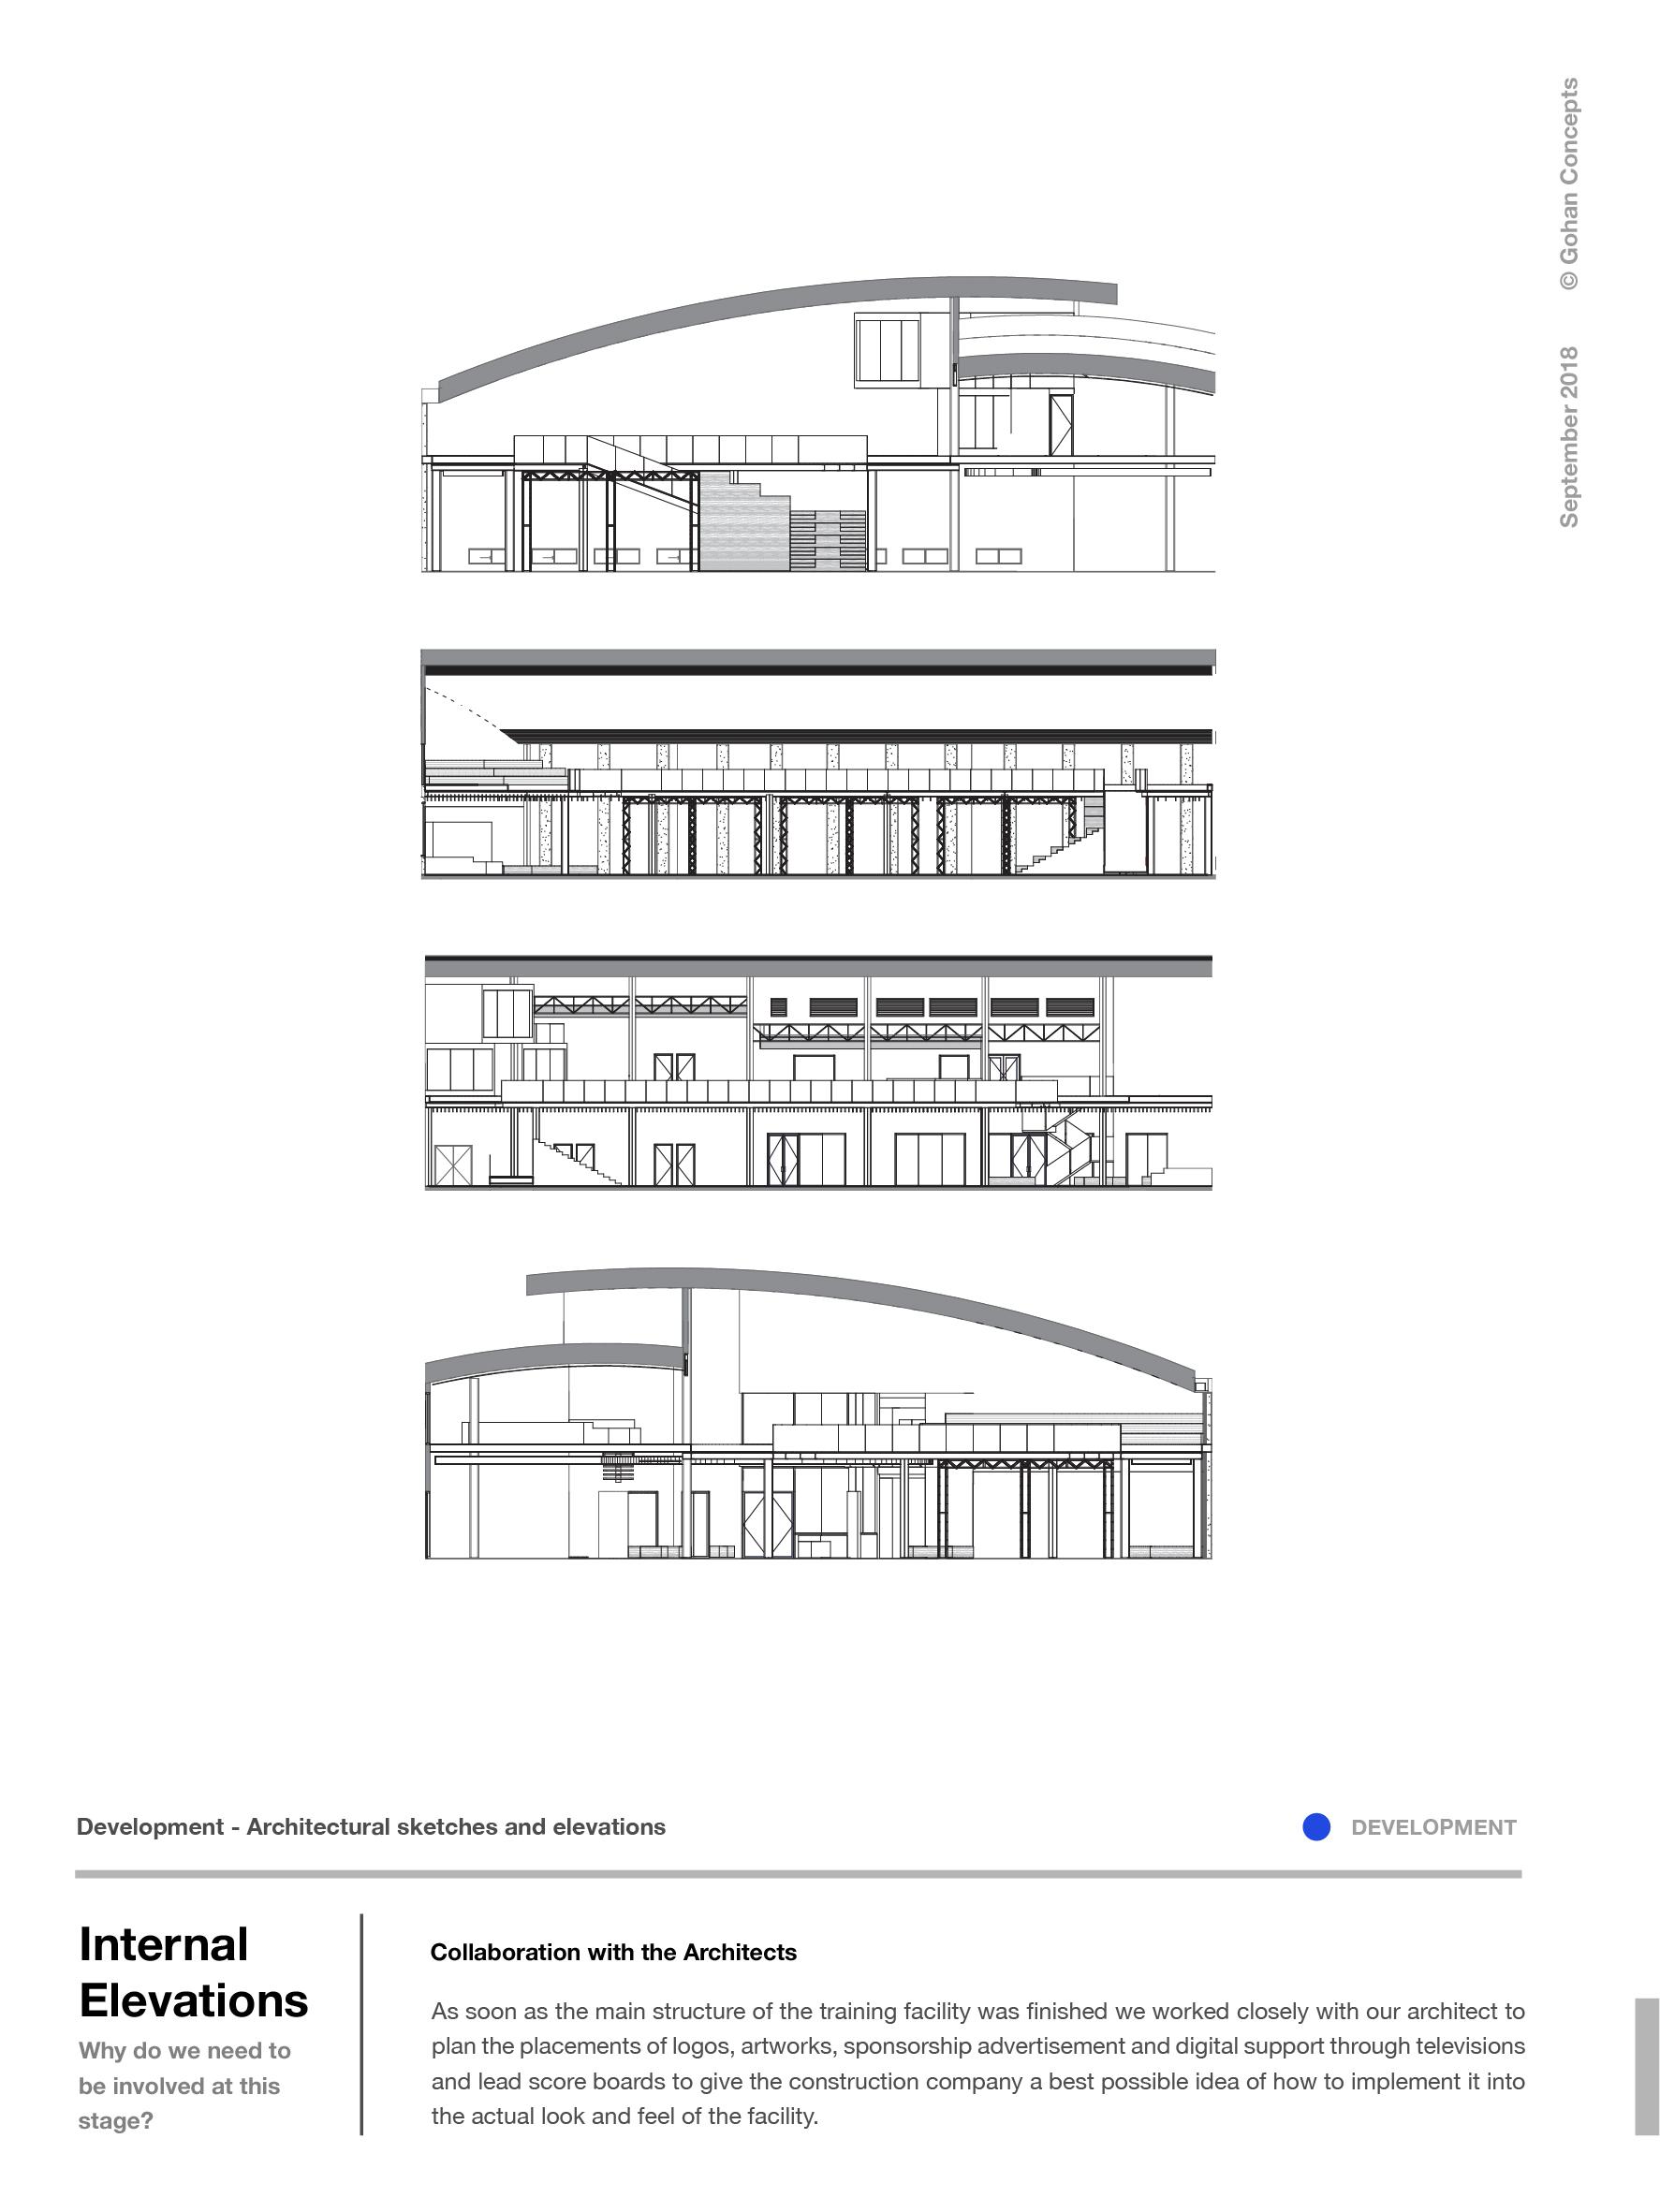 Case Study Final Layout Template-12.jpg